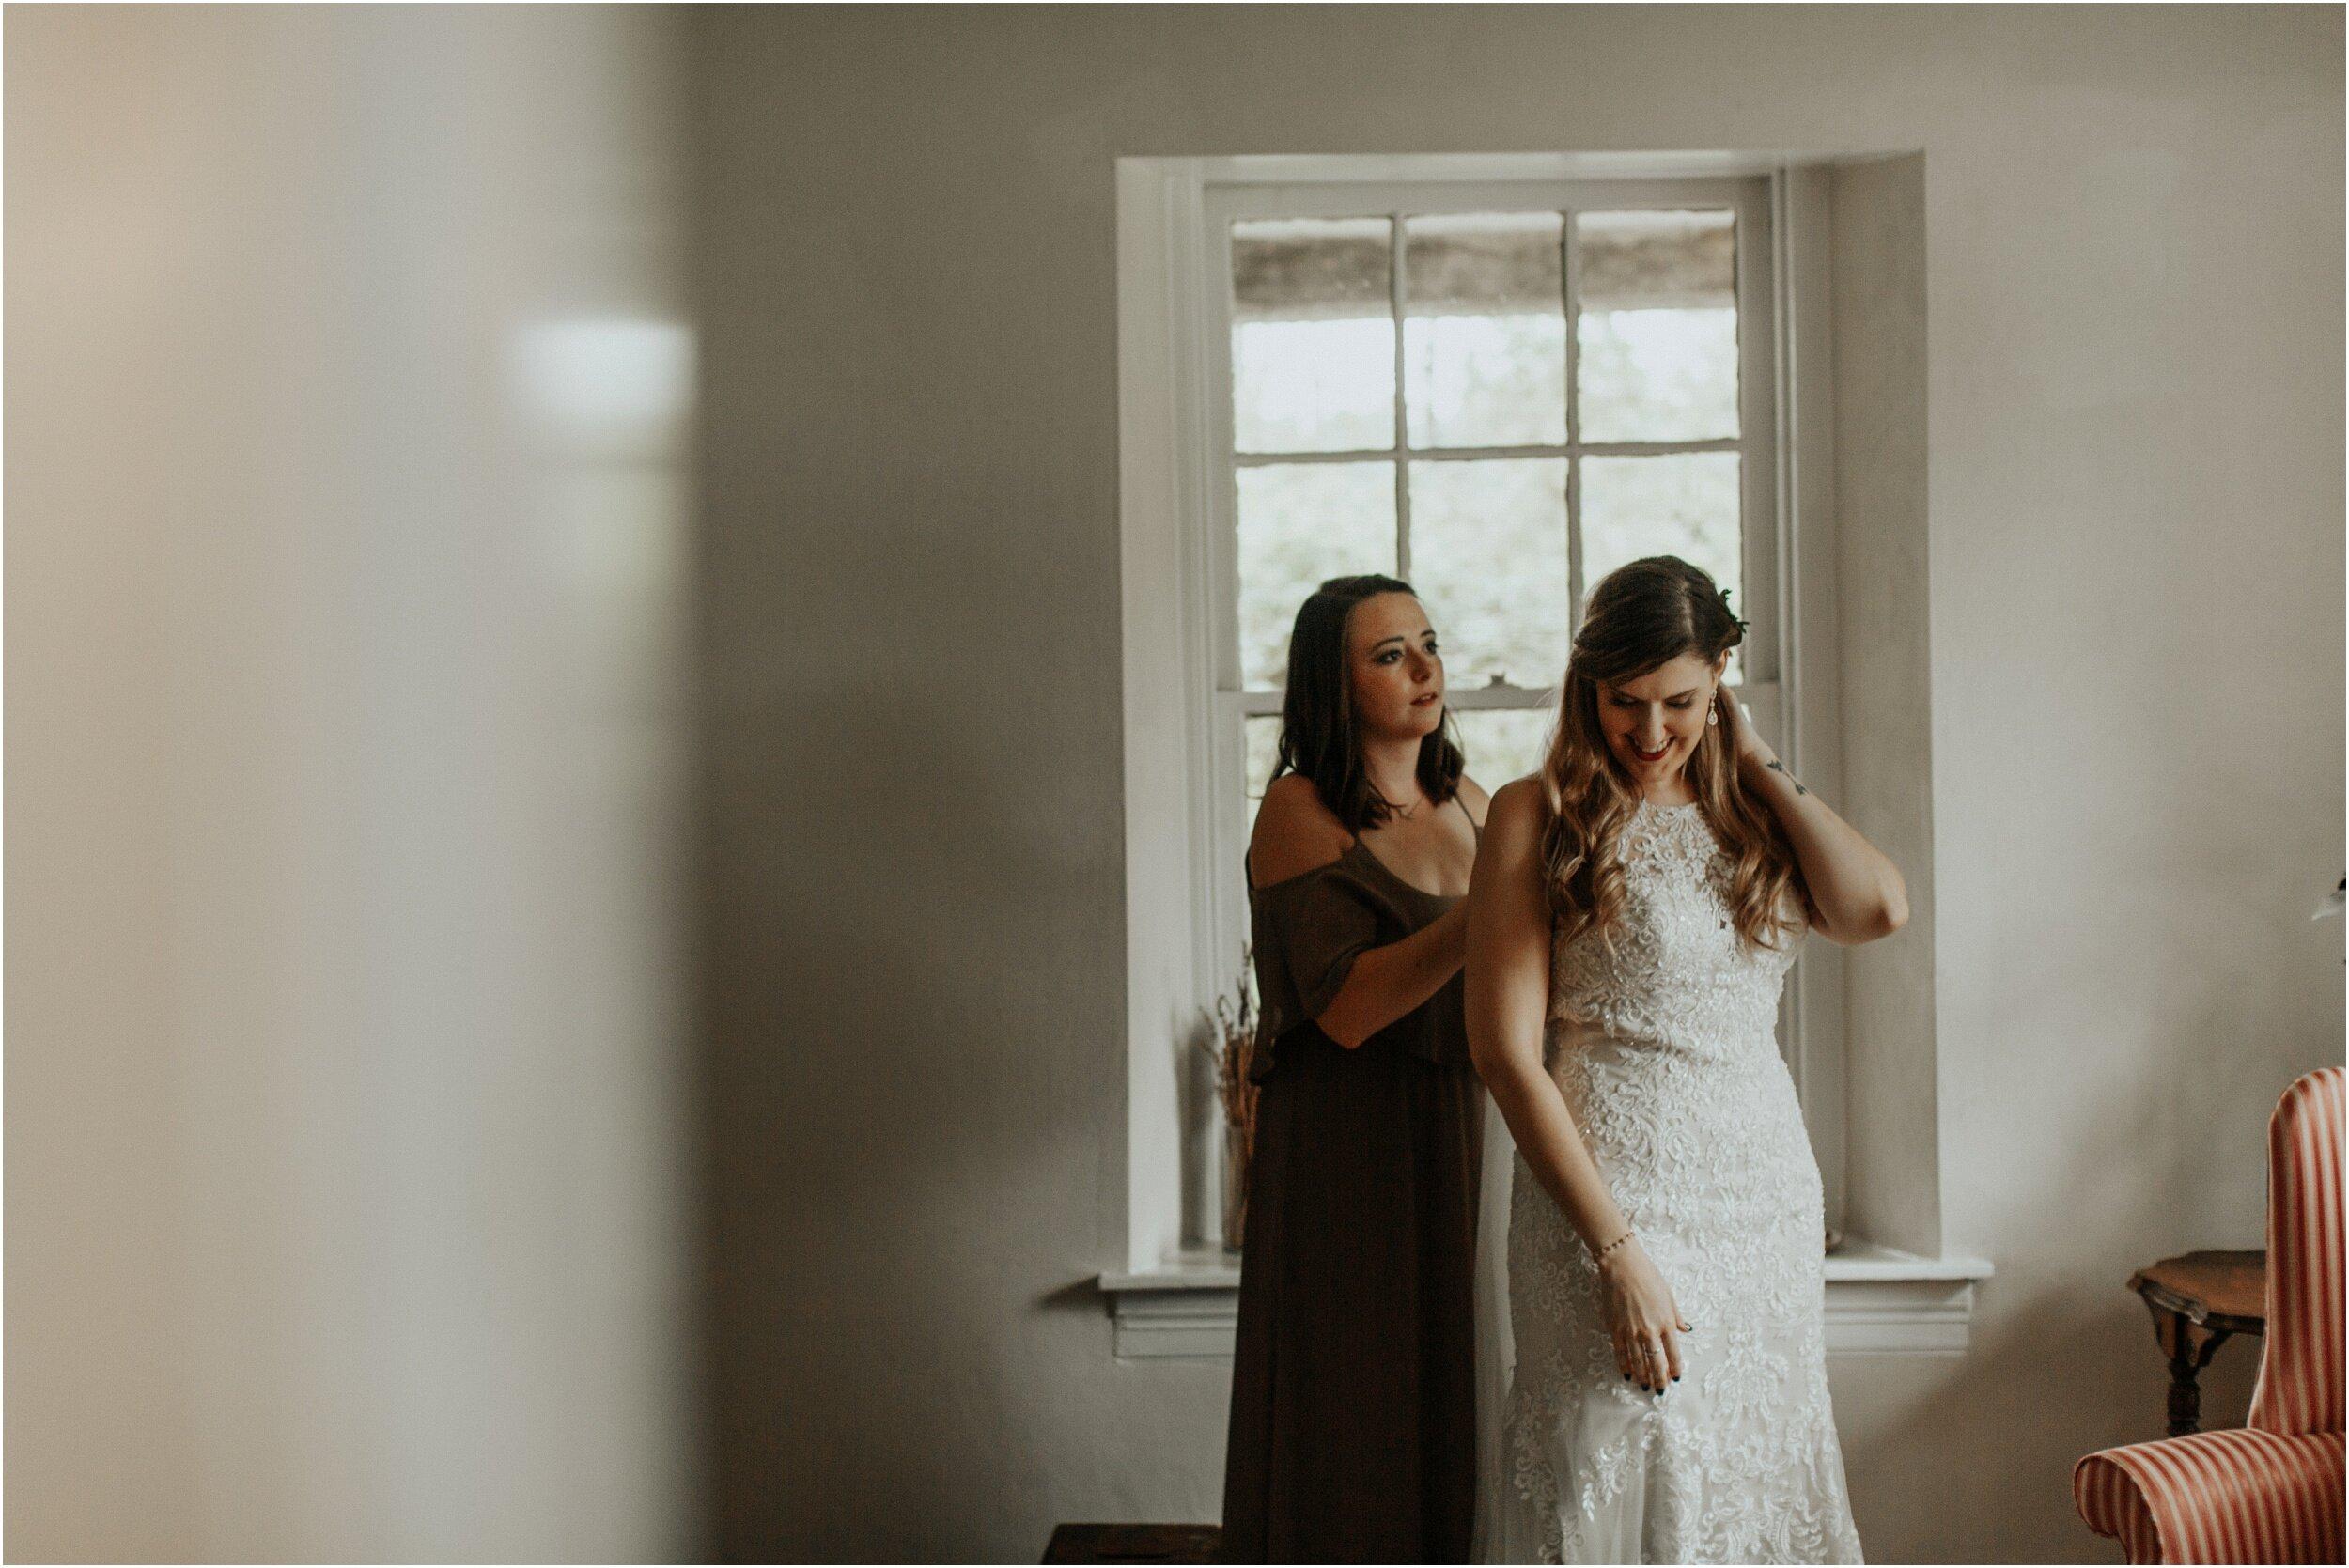 steph-and-jordan-cox-our-wedding-historic-shady-lane-compass-wedding-collective-hazel-lining-photography-destination-elopement-wedding-engagement-photography_0018.jpg